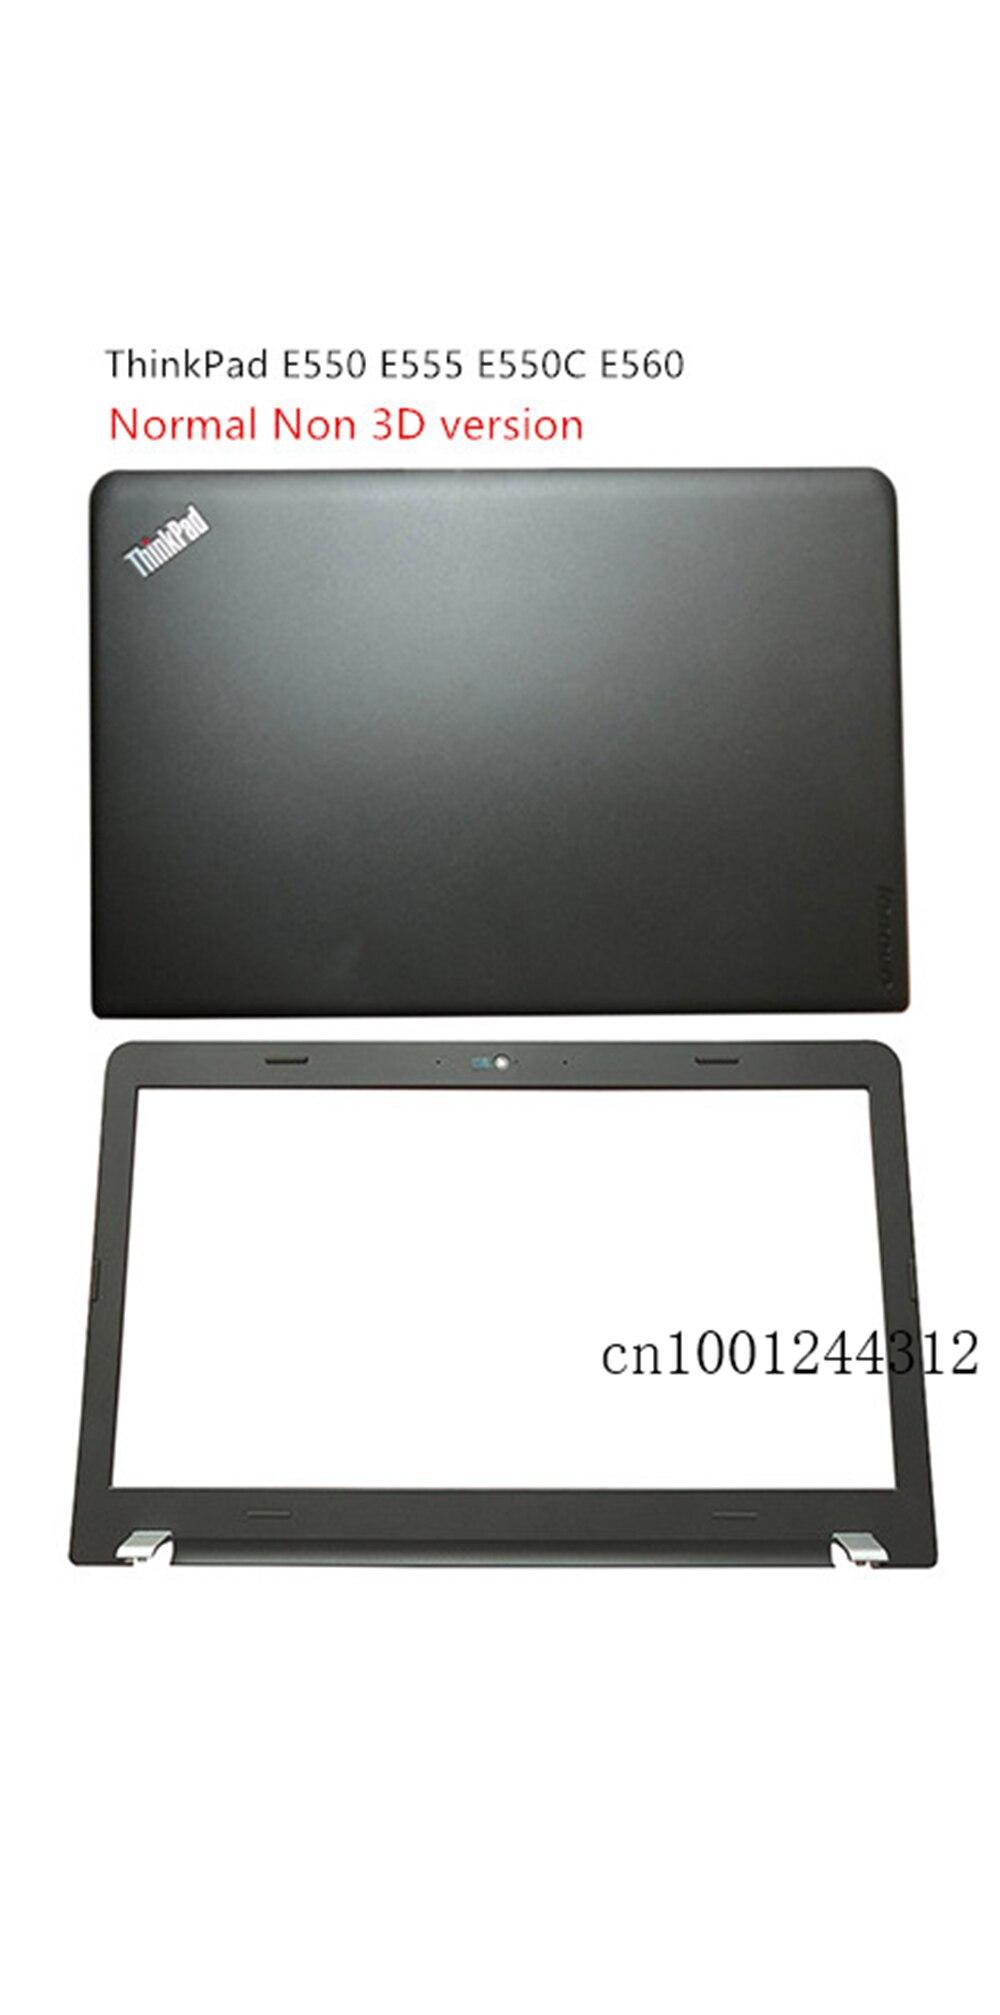 Nuevo Original para Lenovo ThinkPad E550 E555 E550C E560 LCD tapa trasera superior cubierta trasera marco frontal bisel NO/3D 00HN434